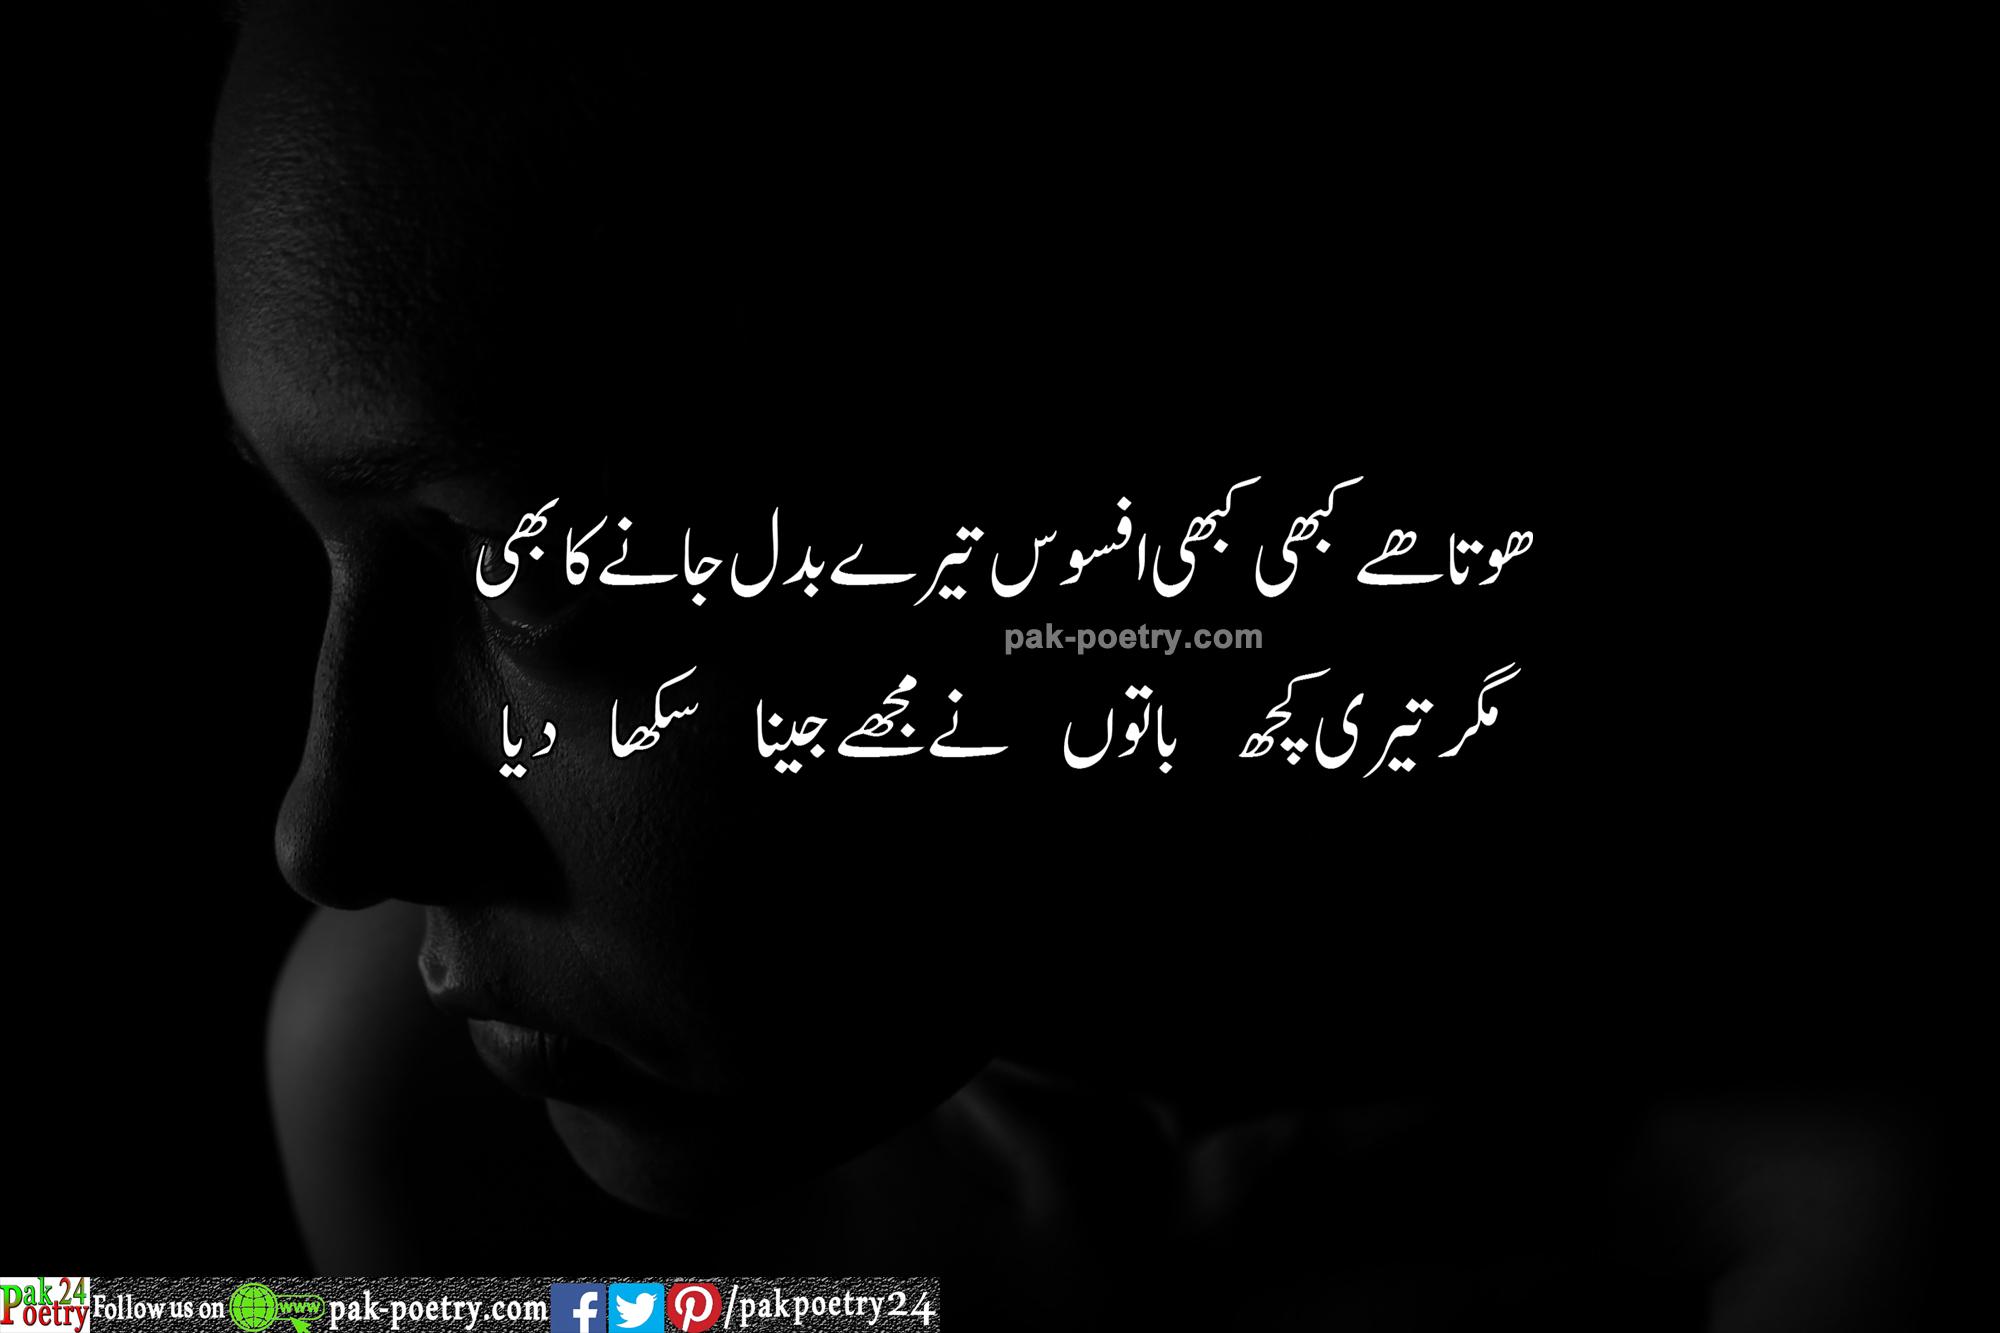 reality poetry - hota hy afsos kbhi kbhi tery bdel